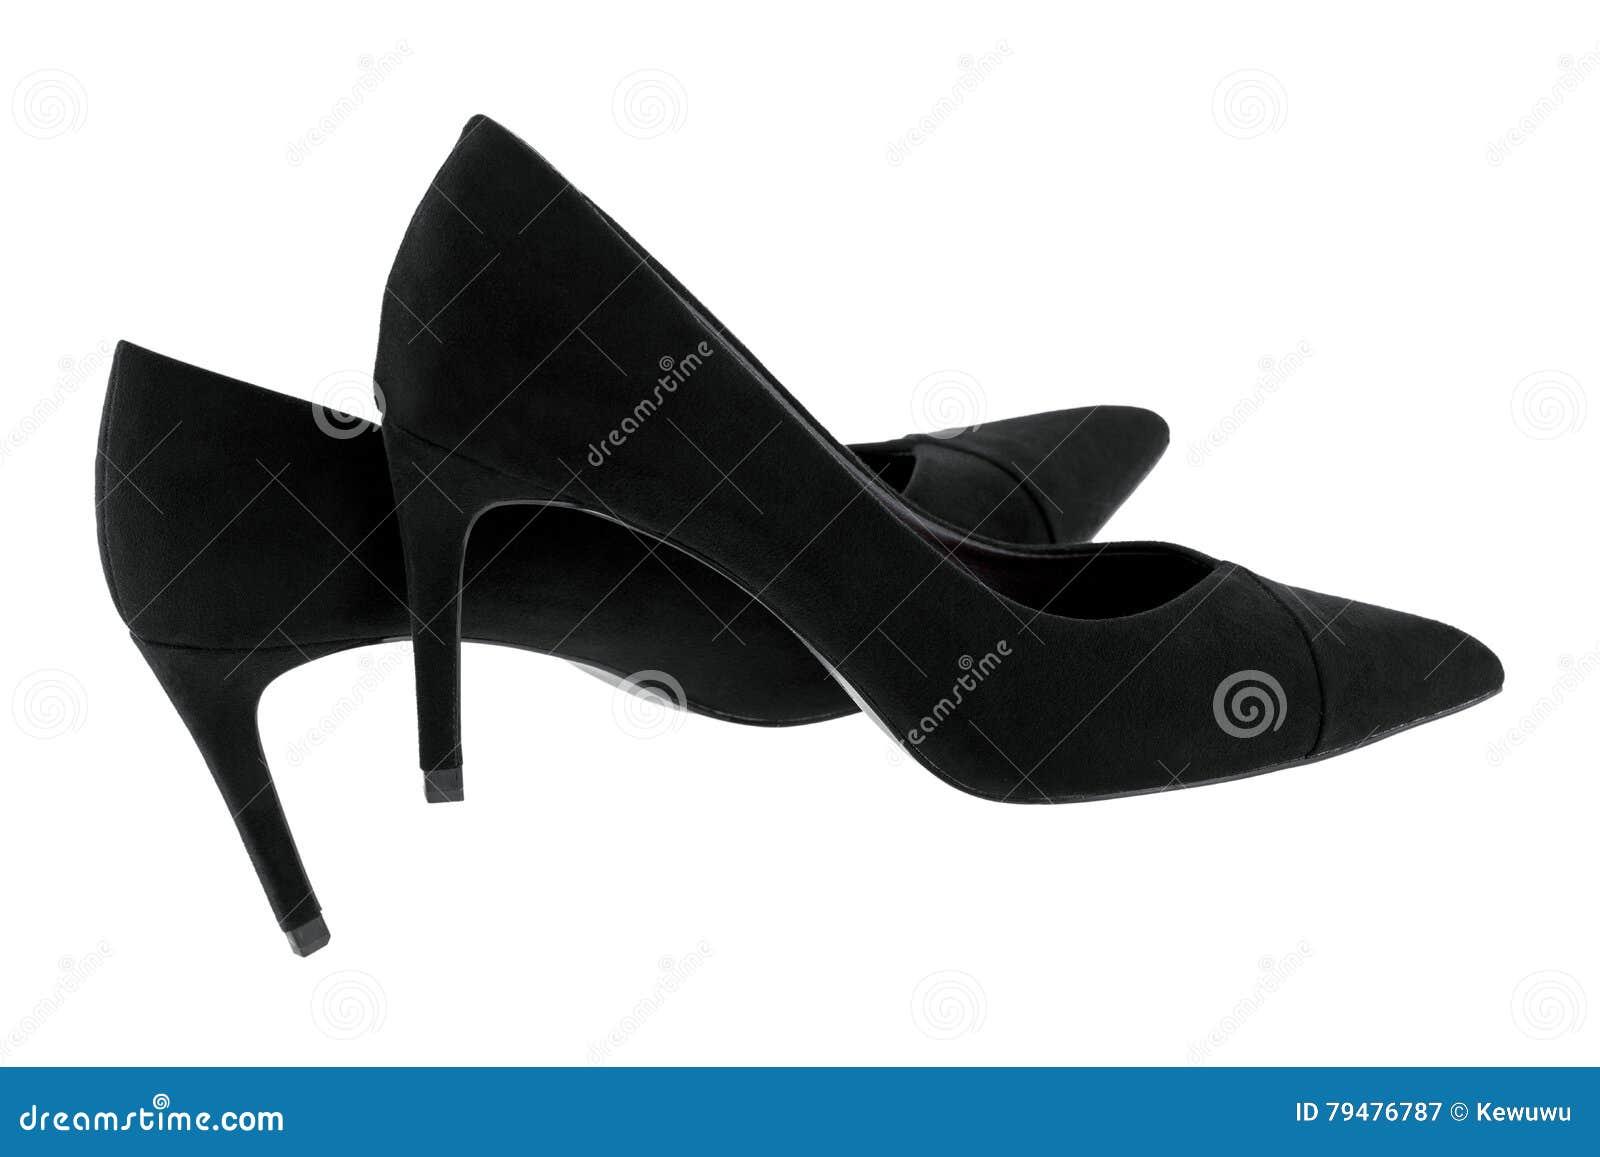 aa7fd609b53 New Pair Of Black Velvet High Heels, Beautiful Shoes For Ladies ...